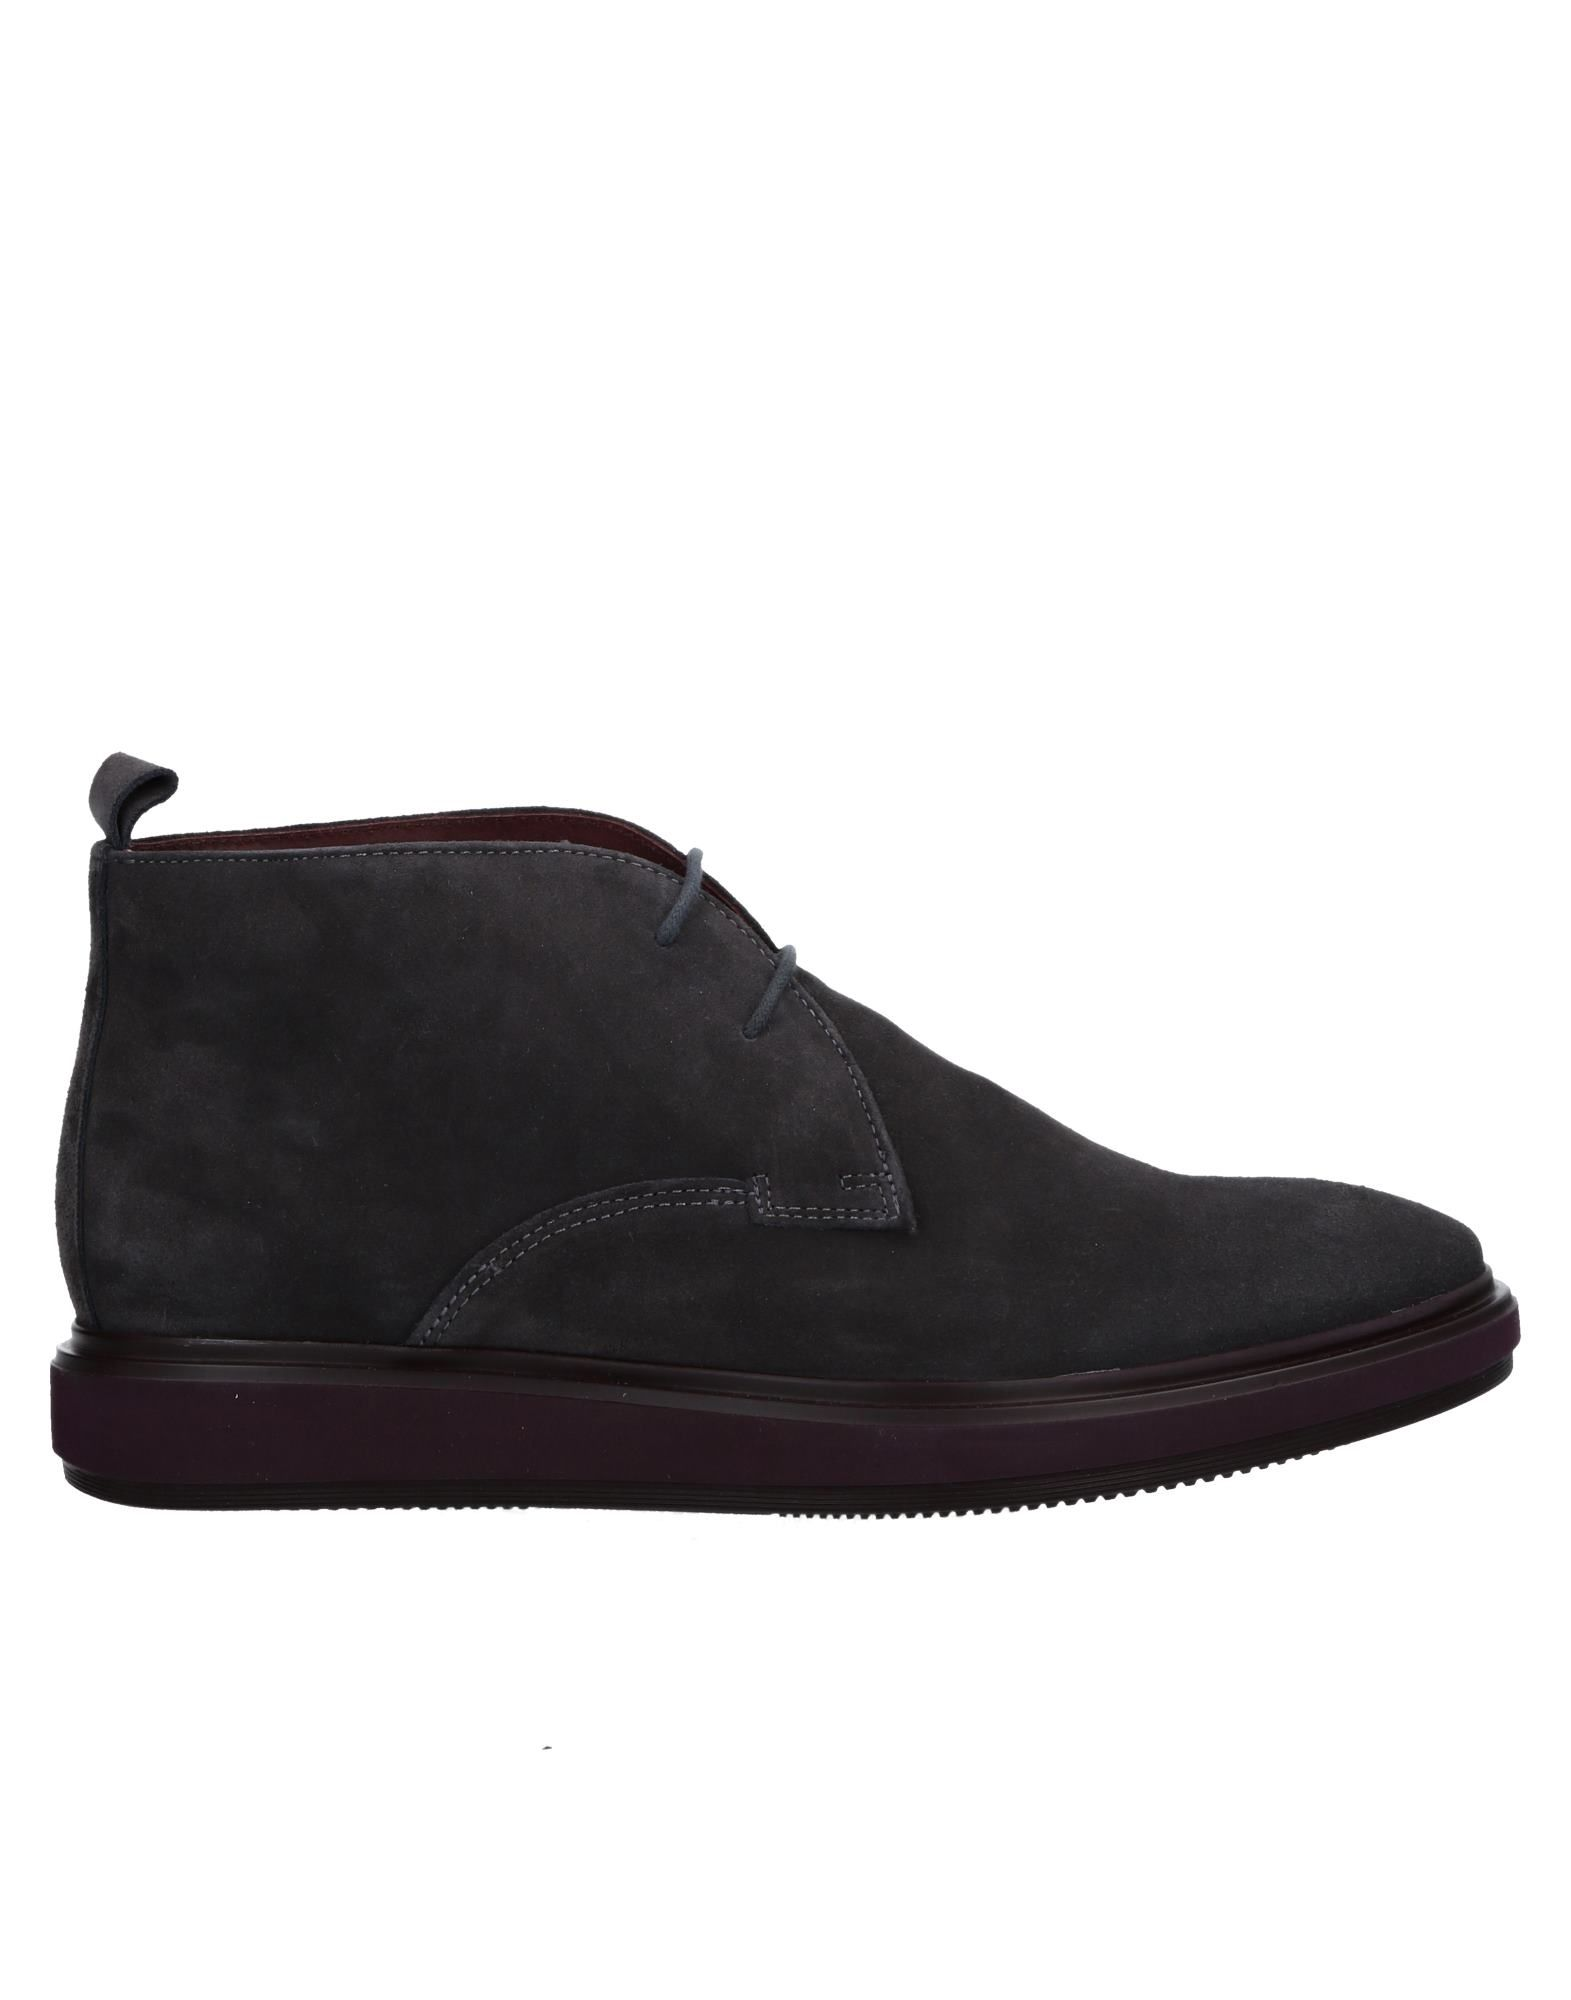 Rabatt echte Stiefelette Schuhe Amalfi Stiefelette echte Herren  11534107QF 668650